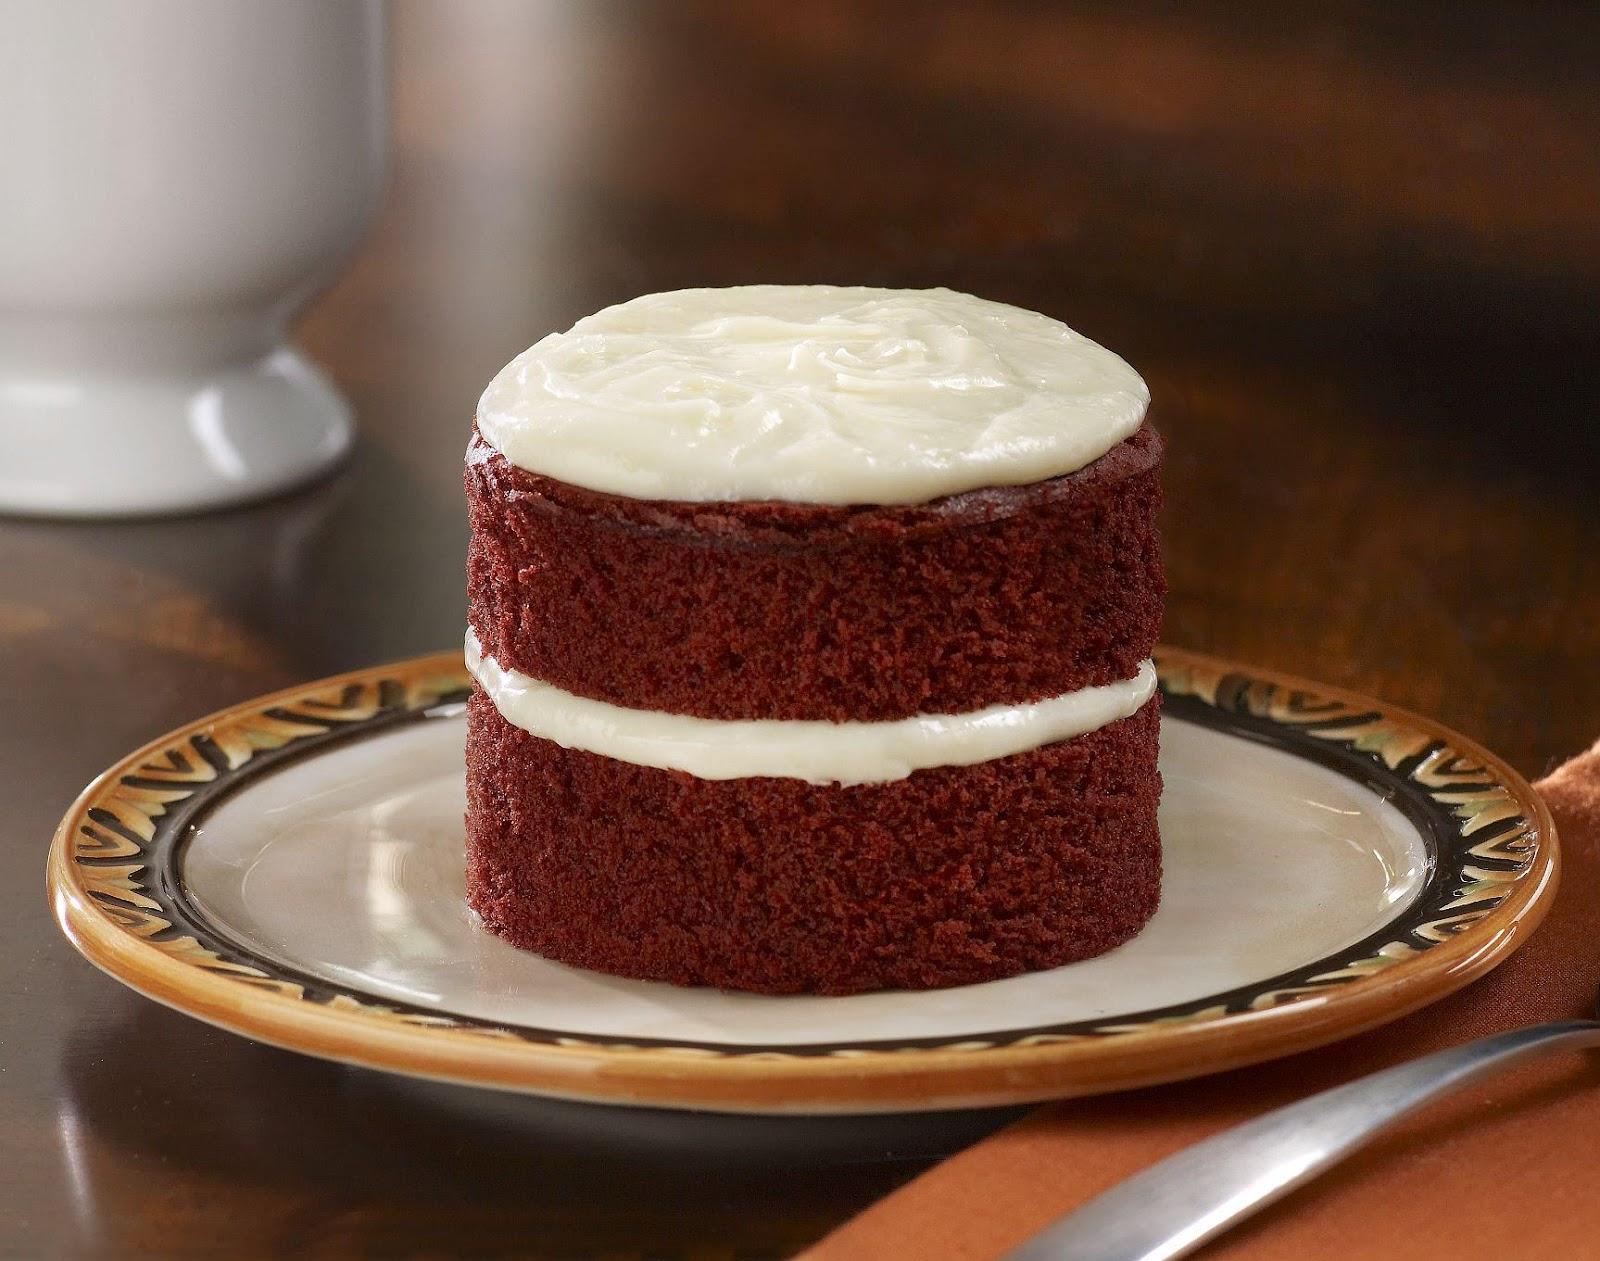 ... Malaysia: Freebies > Tony Roma's Mini Red Velvet Cake (Flash coupon